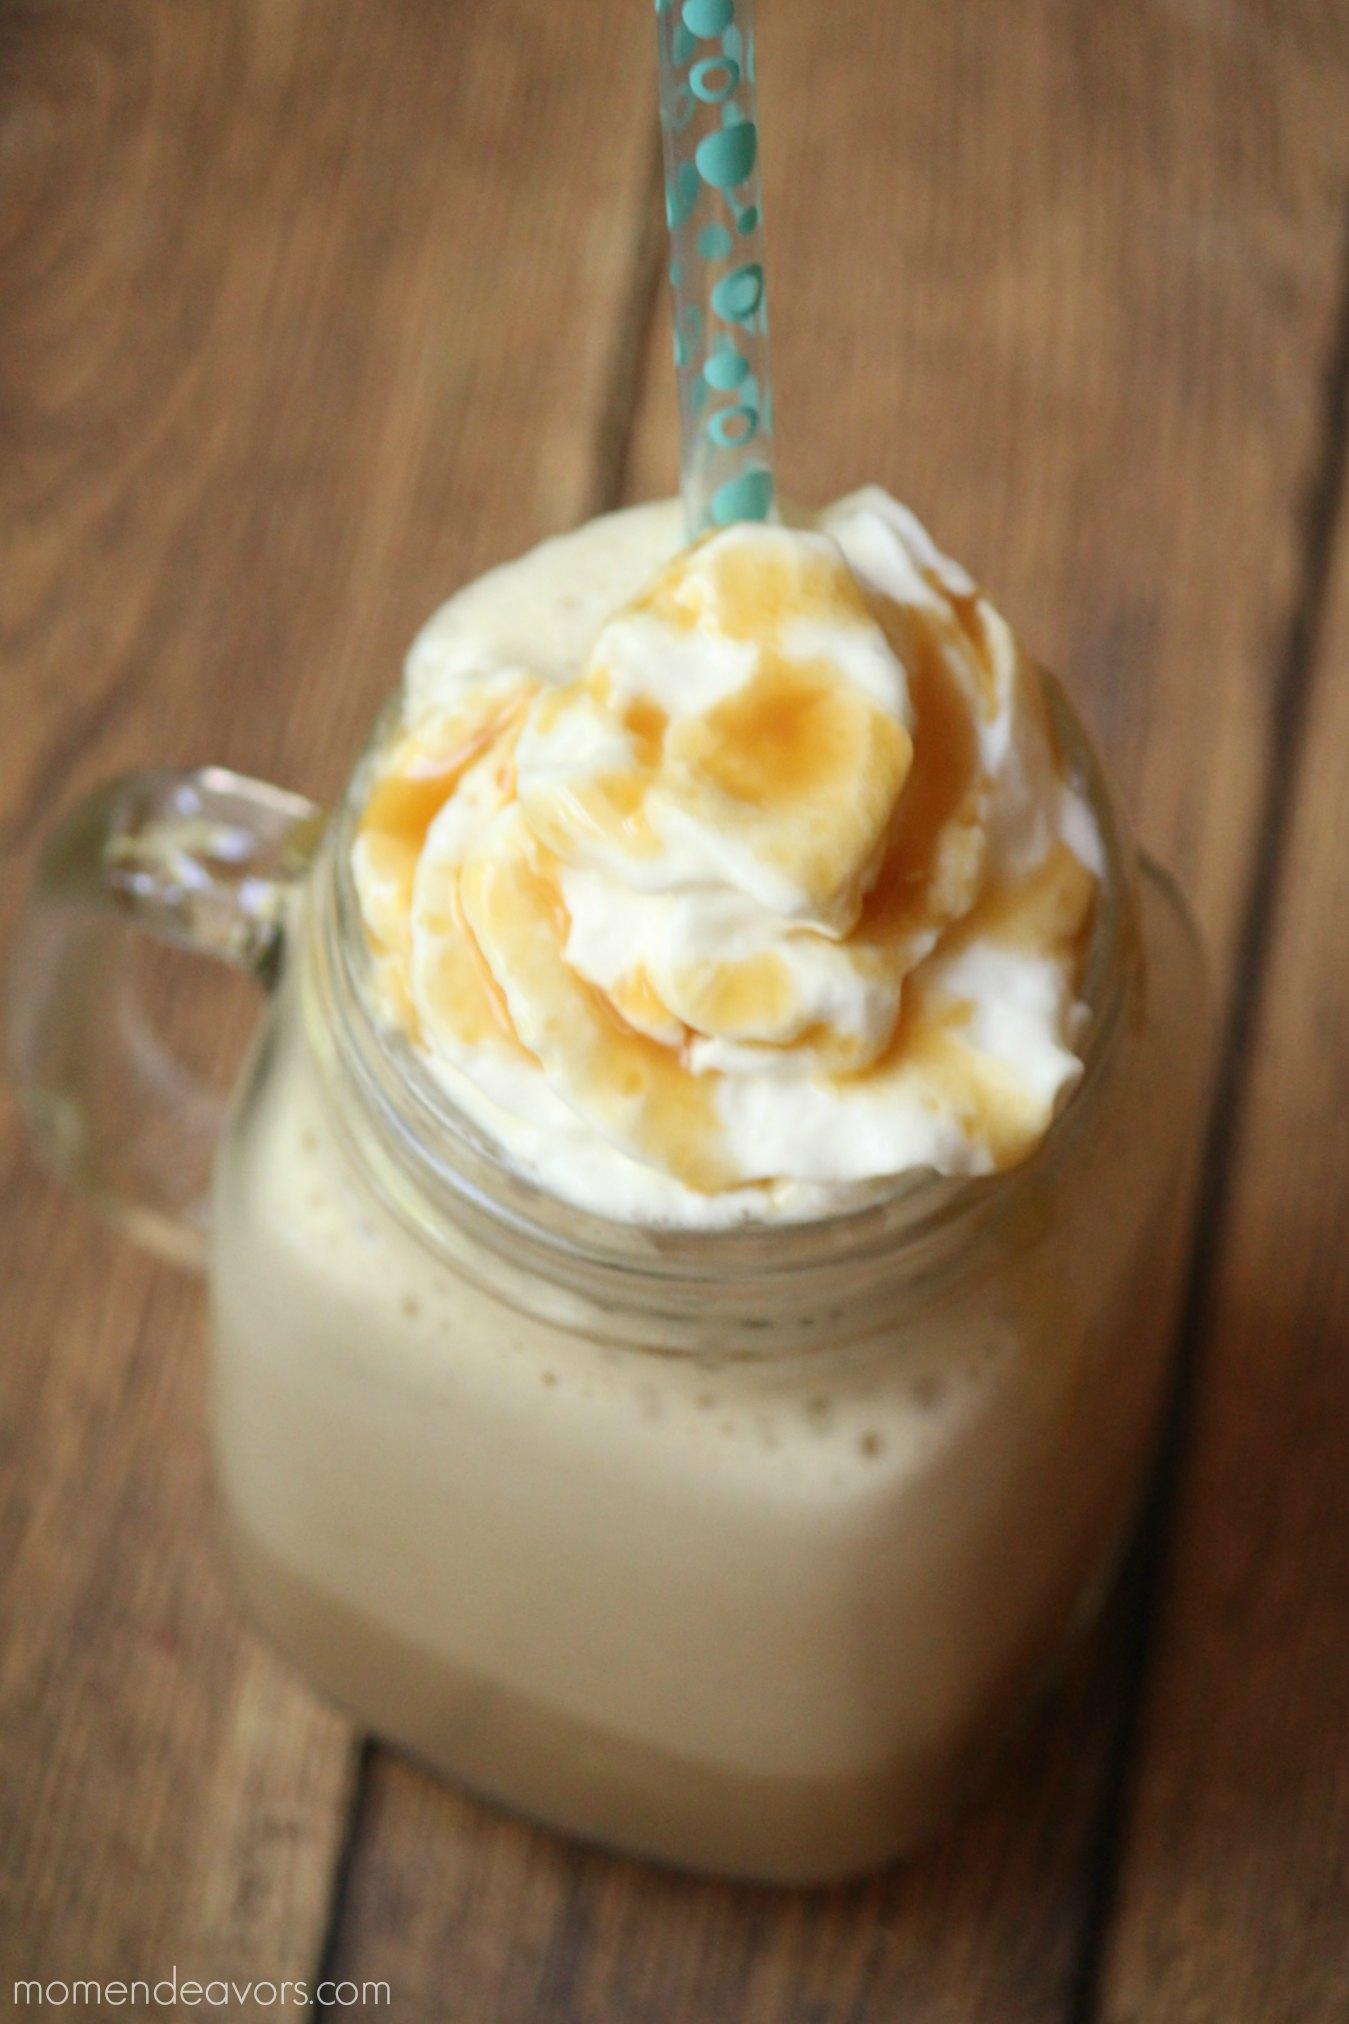 Caramel Macchiato Iced Coffee